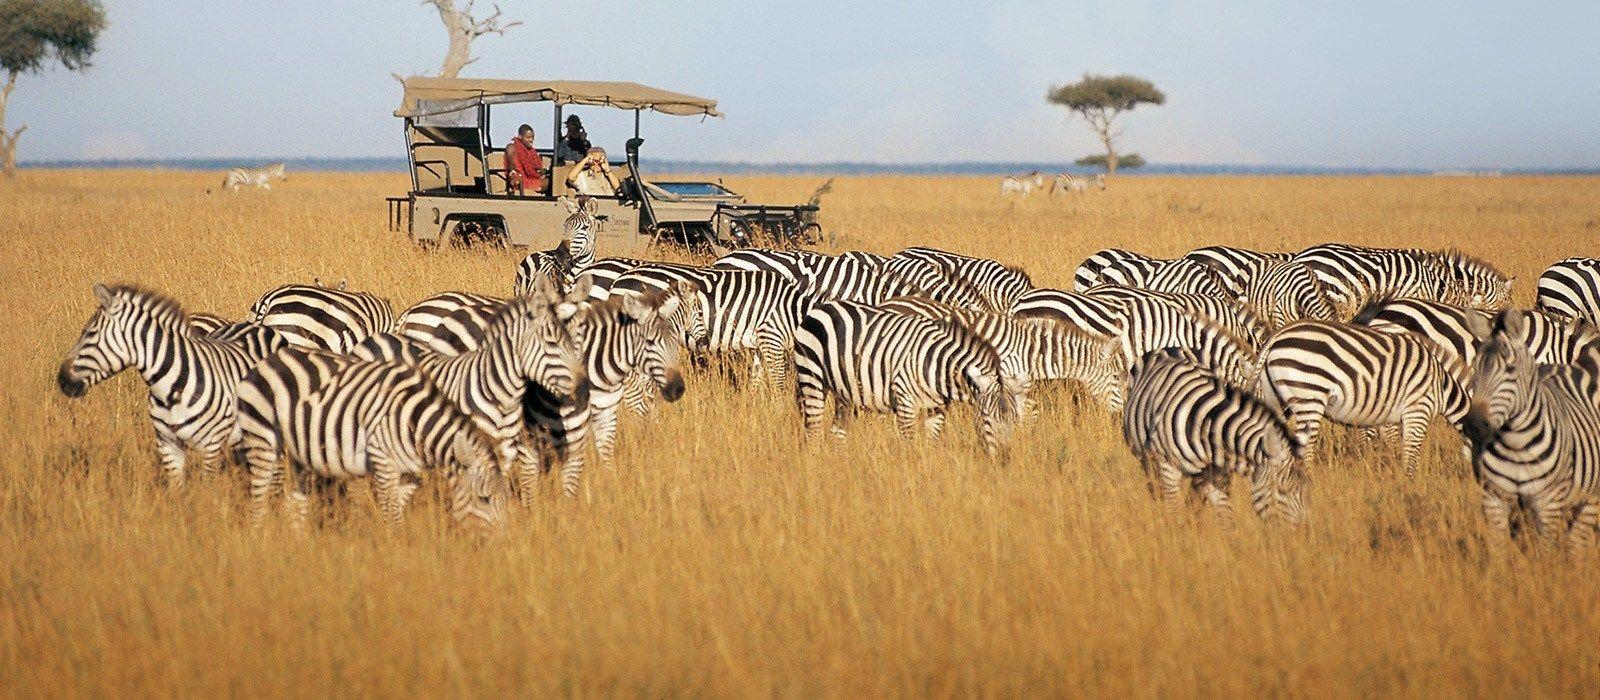 Kenia & Sansibar Reise: Safaris & Strände Urlaub 2